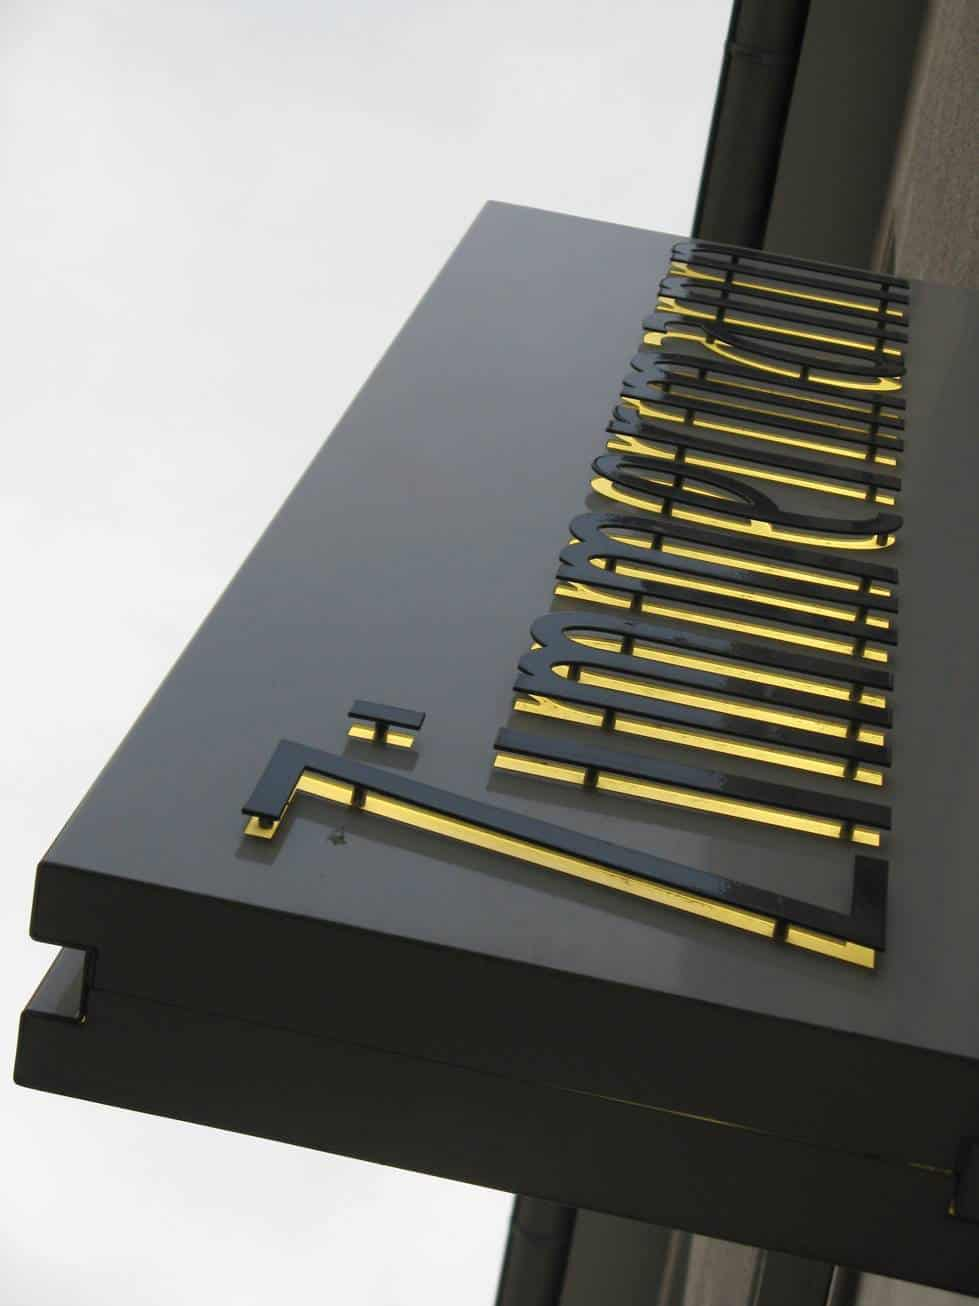 auslegersysteme von infographik. Black Bedroom Furniture Sets. Home Design Ideas